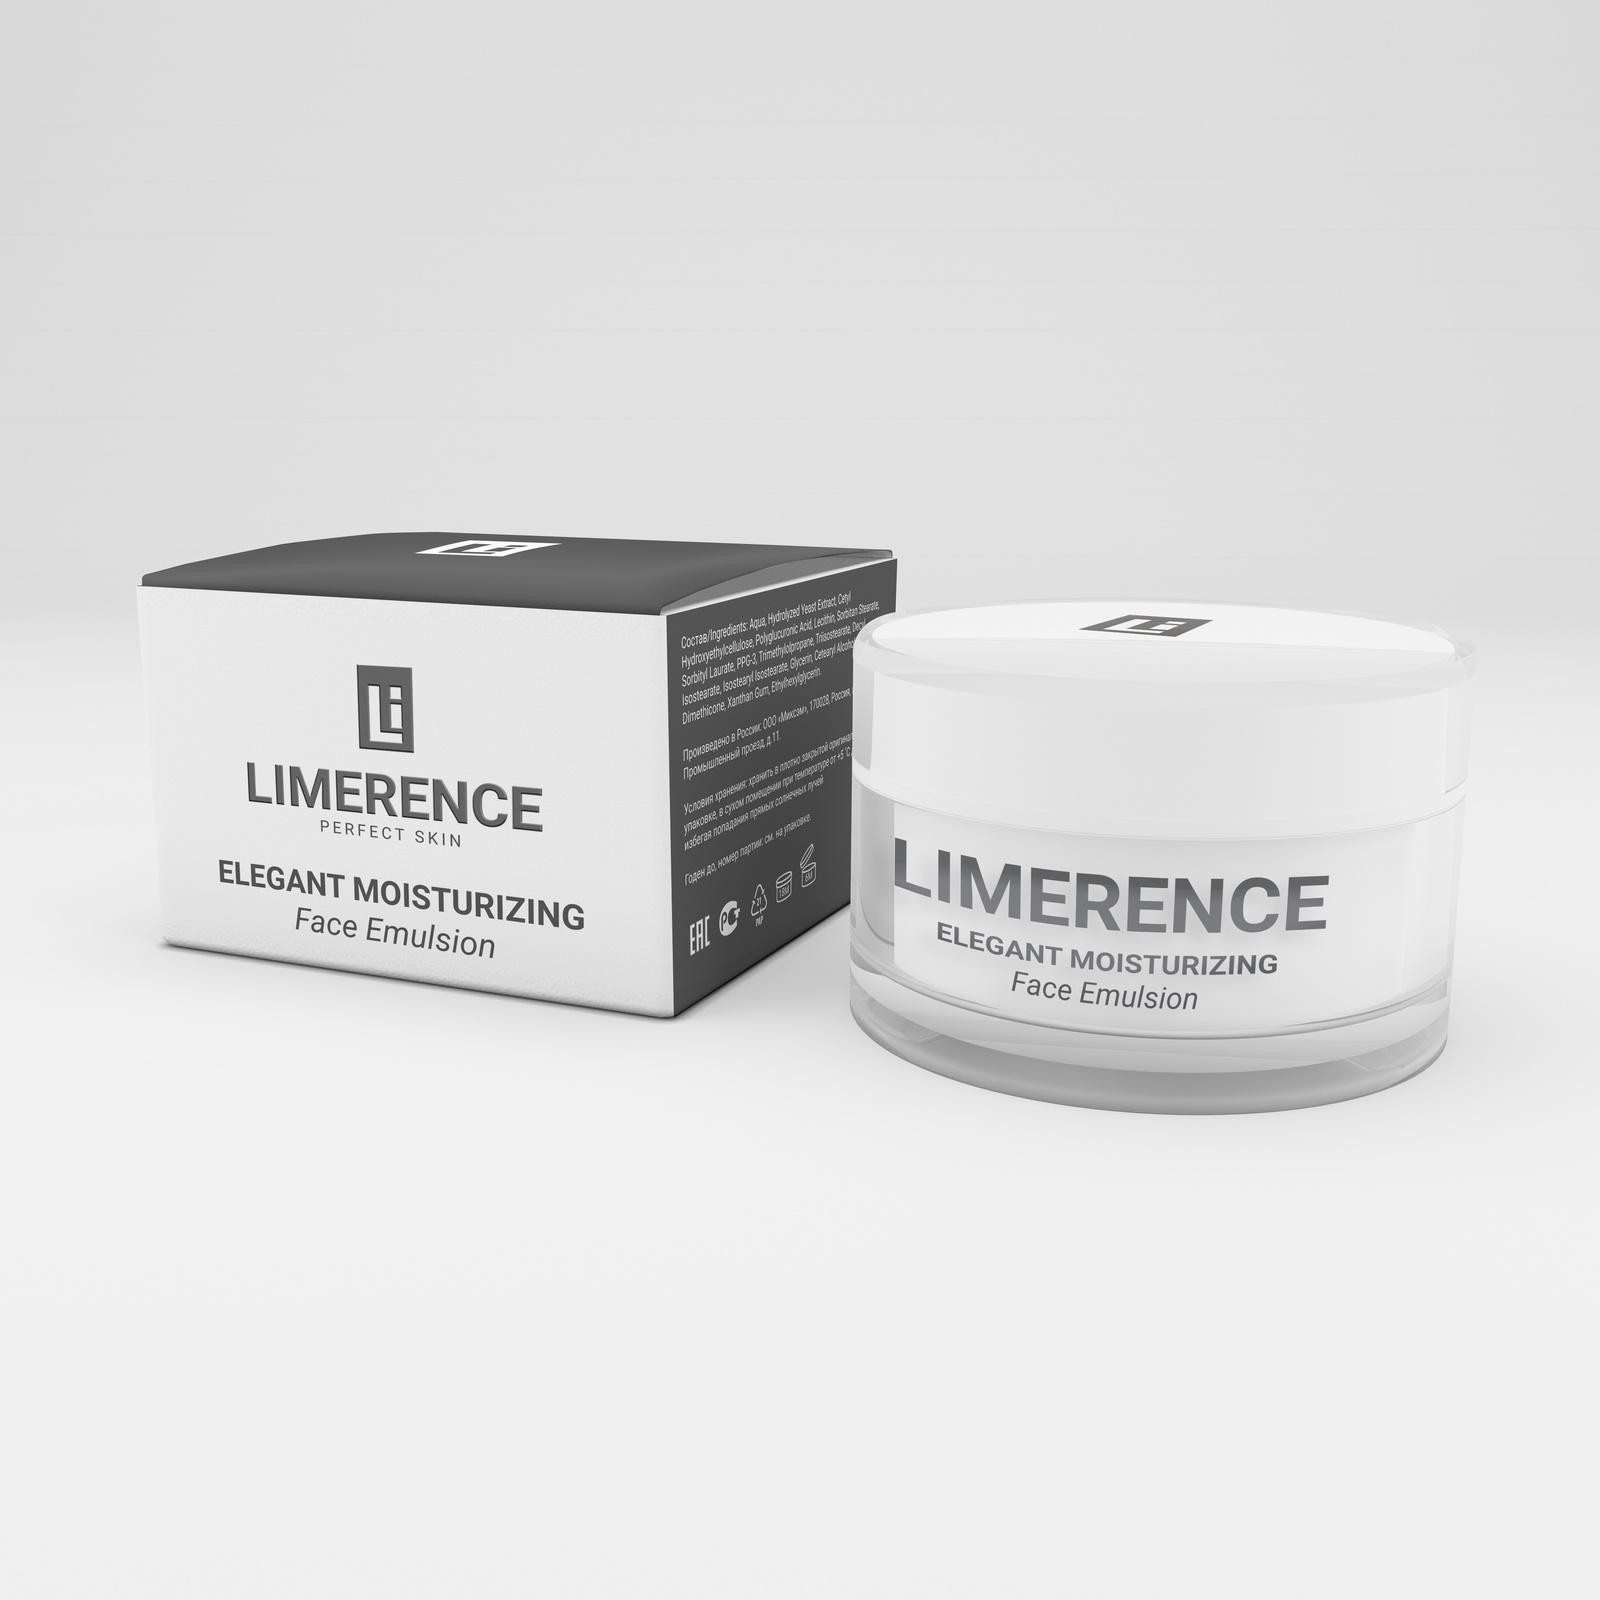 Limerence Увлажняющая эмульсия для лица Elegant Moisturizing Face Emulsion, 50 мл увлажняющая эмульсия для лица aloe soothing emulsion 90 отзывы